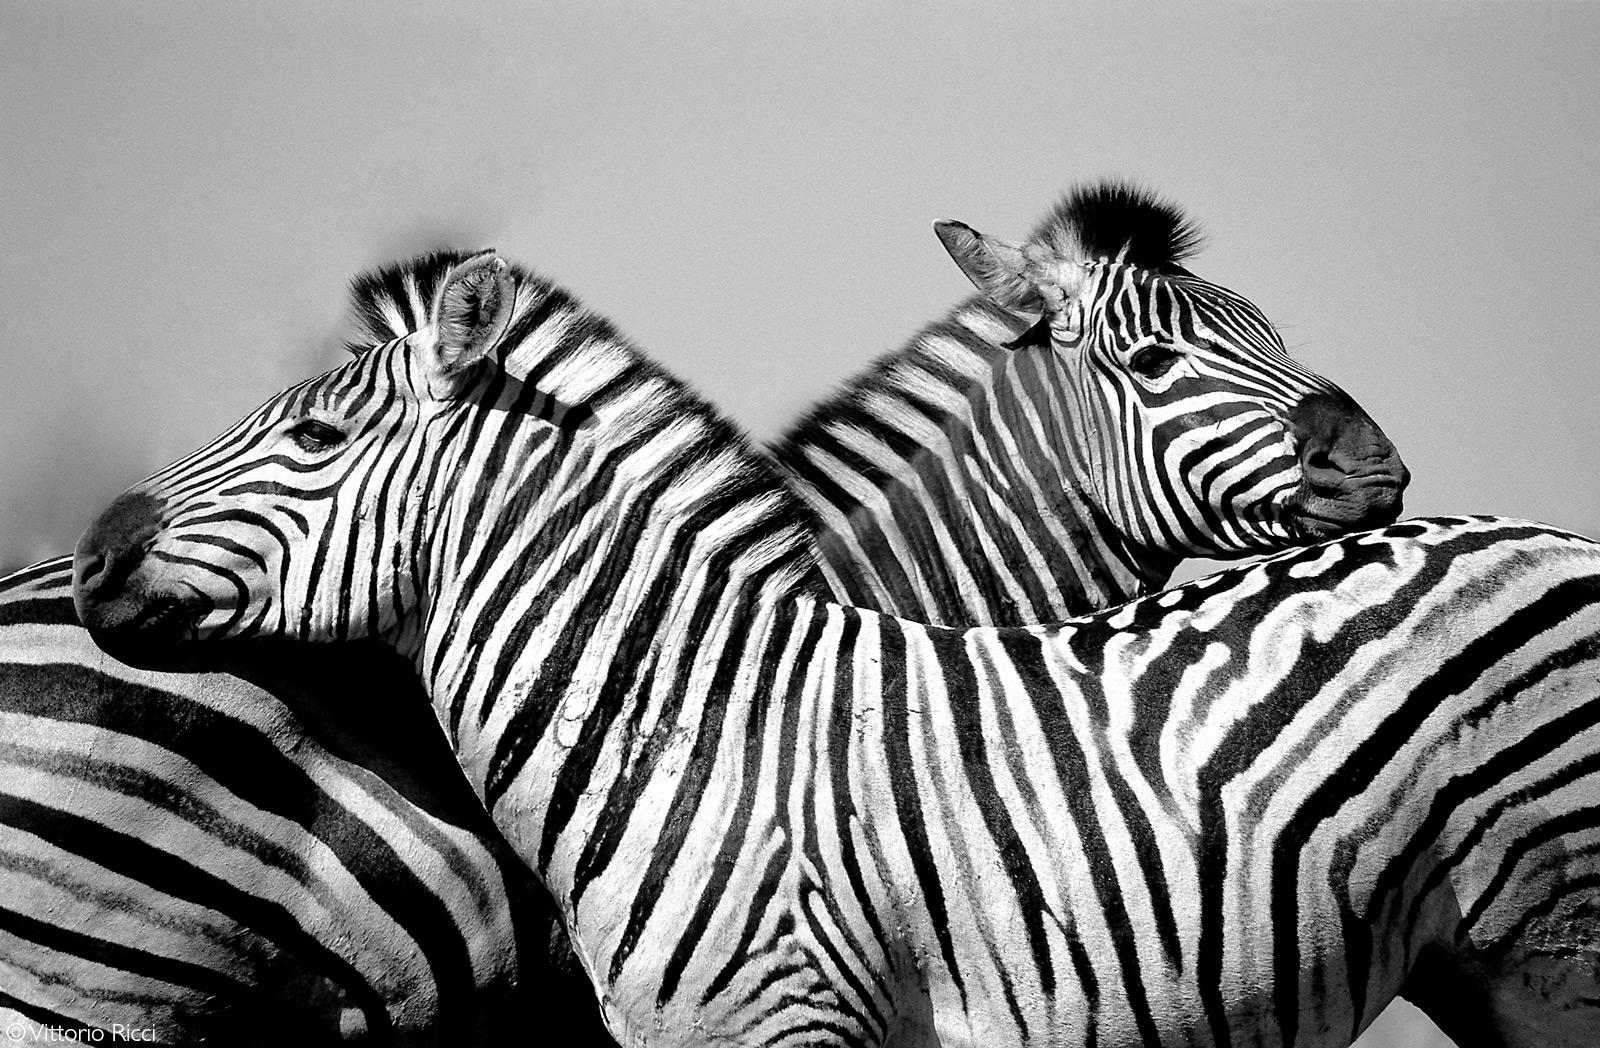 Zebras resting with caution near to a waterhole. Etosha National Park, Namibia © Vittorio Ricci